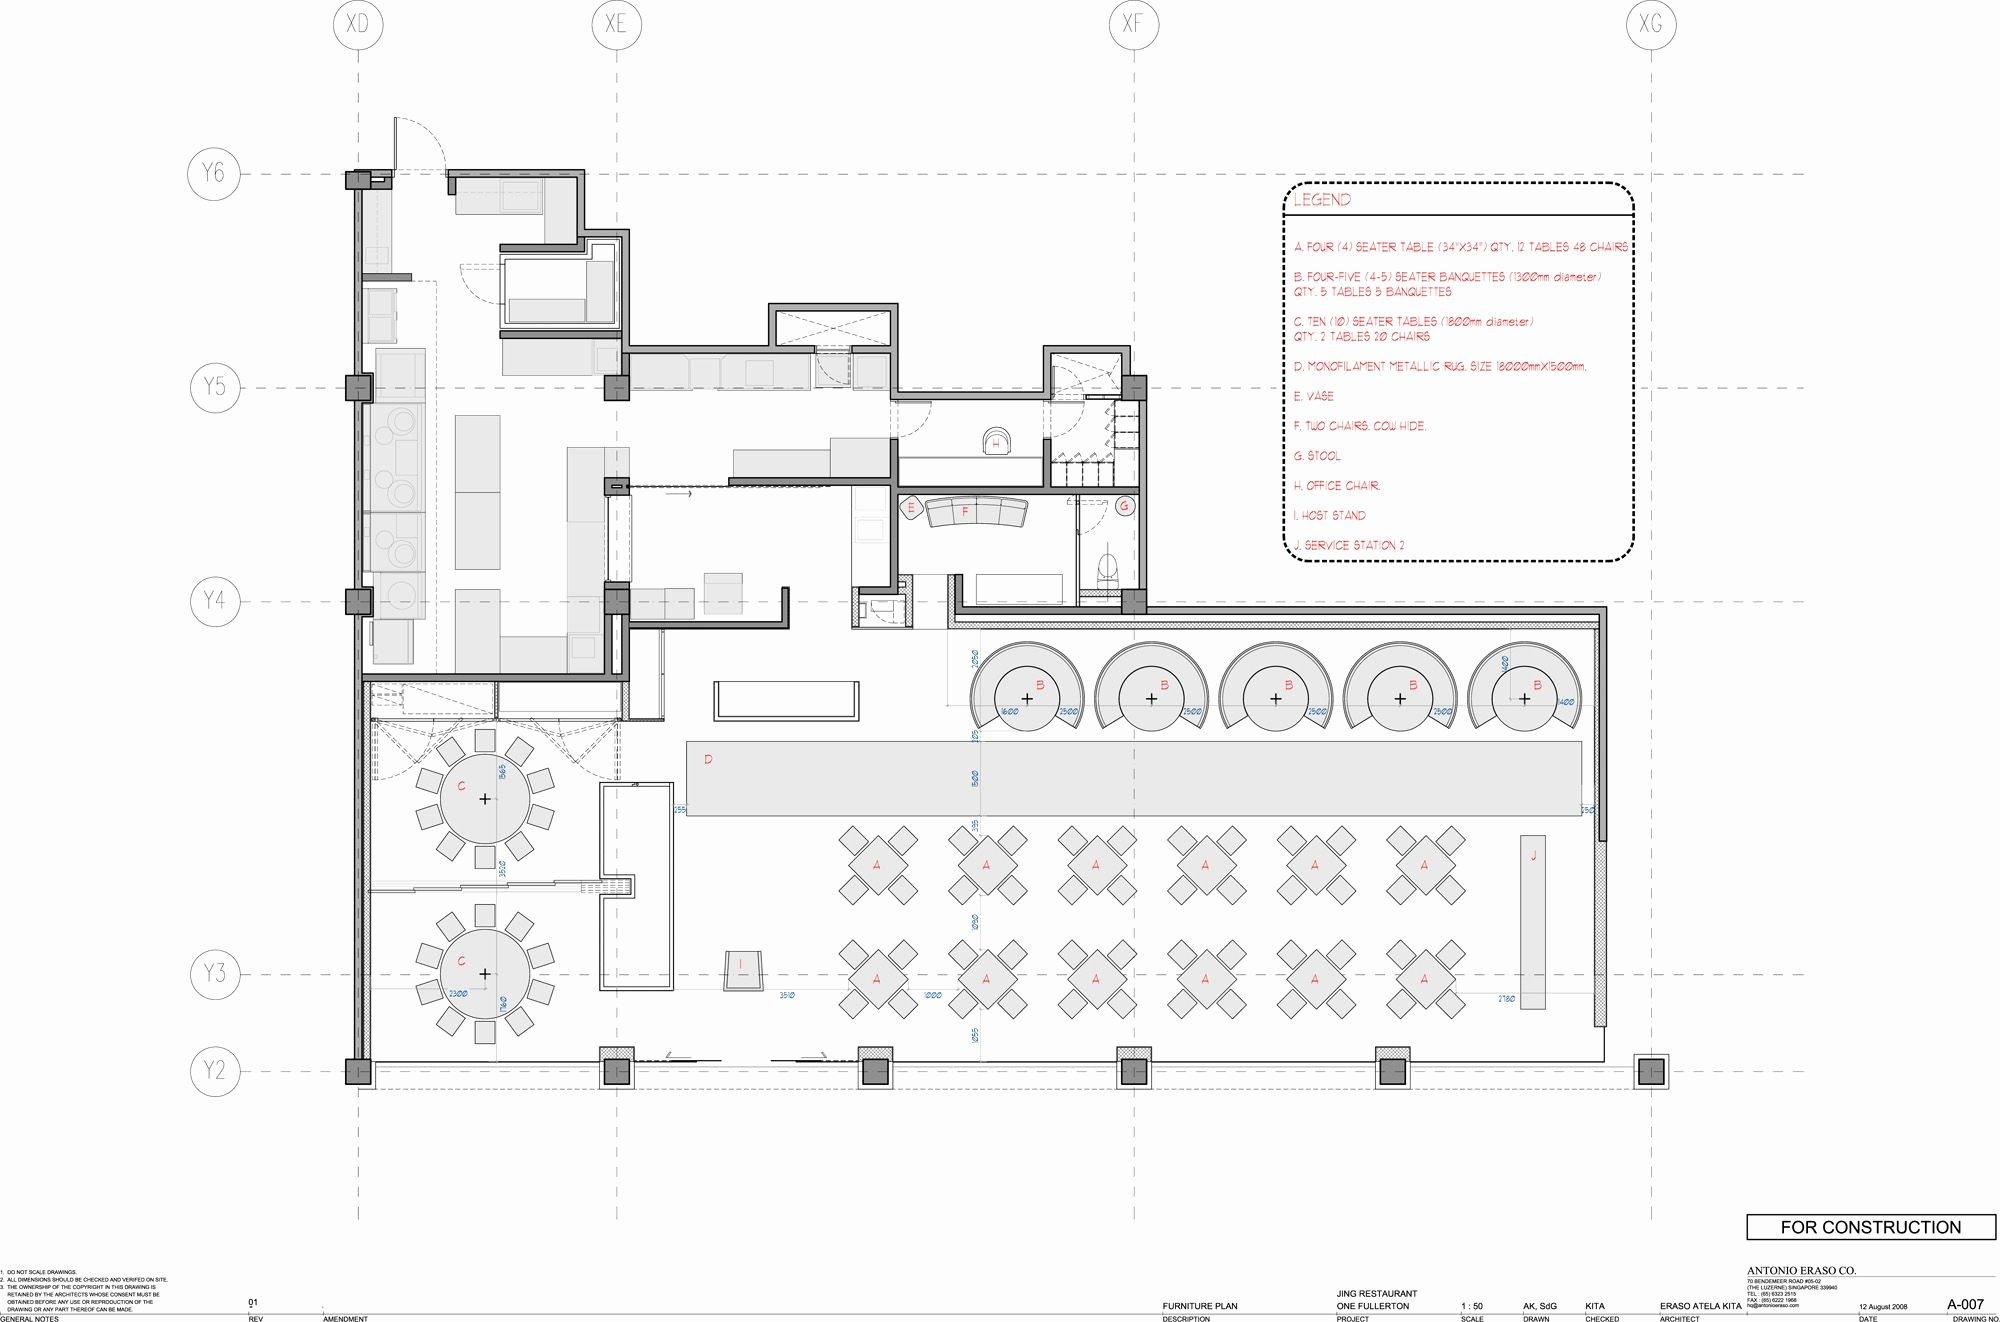 Restaurant Floor Plan Template Inspirational Jing Restaurant Antonio Eraso